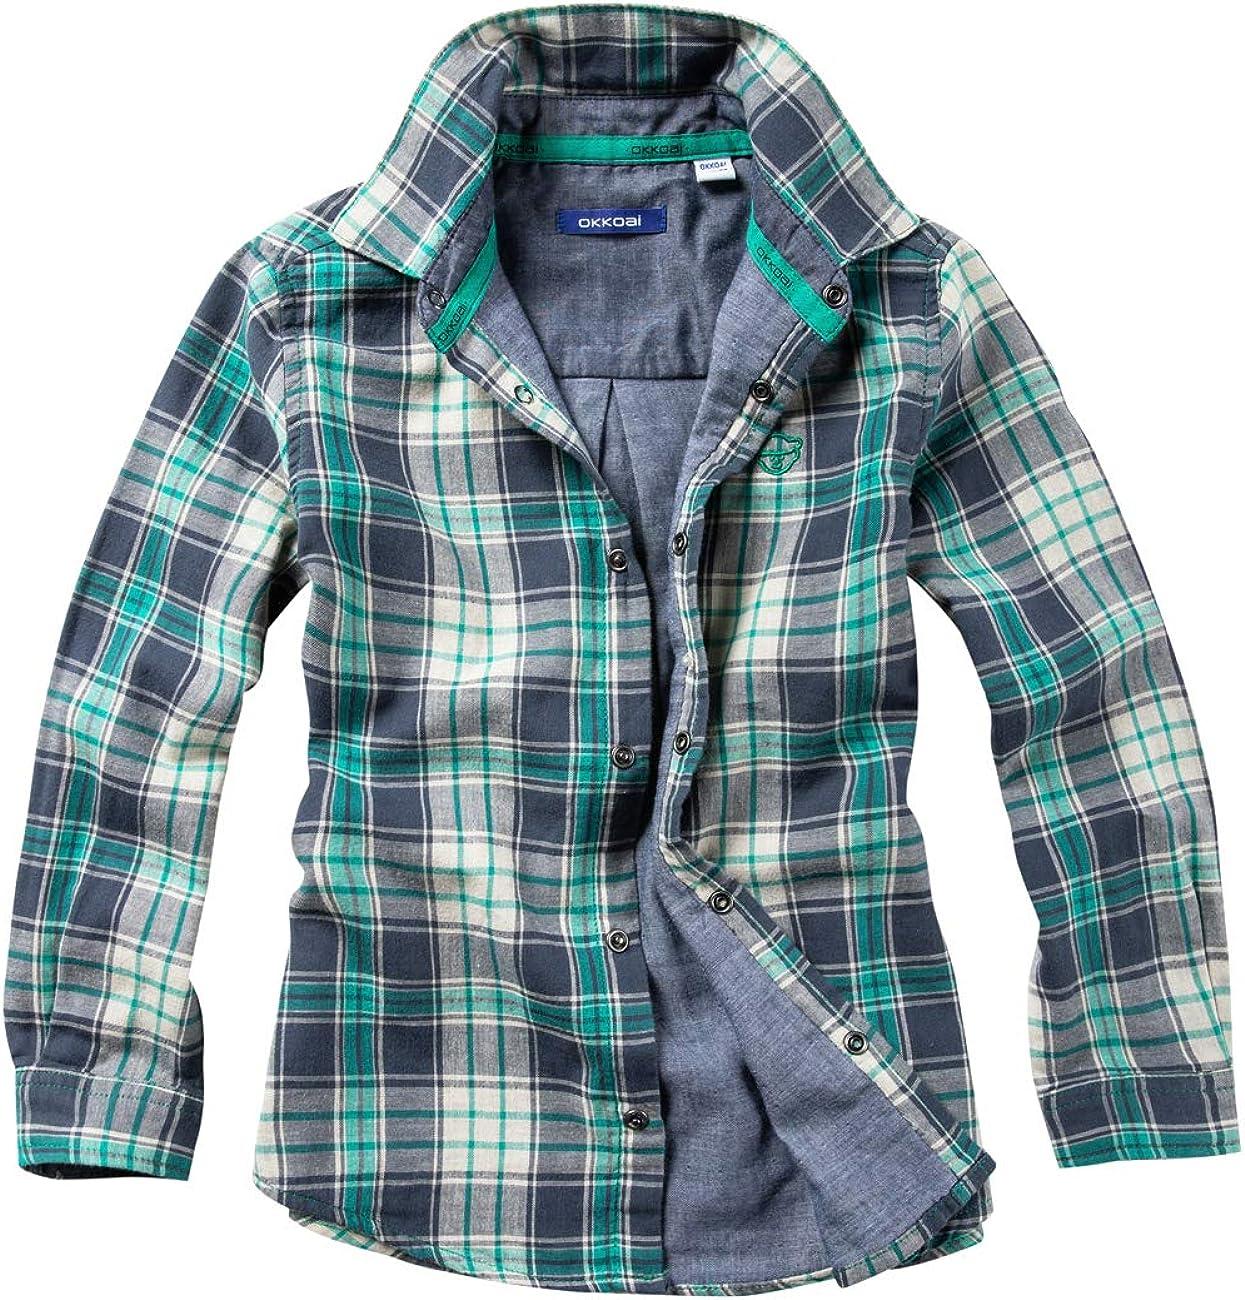 WIYOSHY Boys' Button Down Long Sleeve Cotton Shirts Kids 4-14 Years